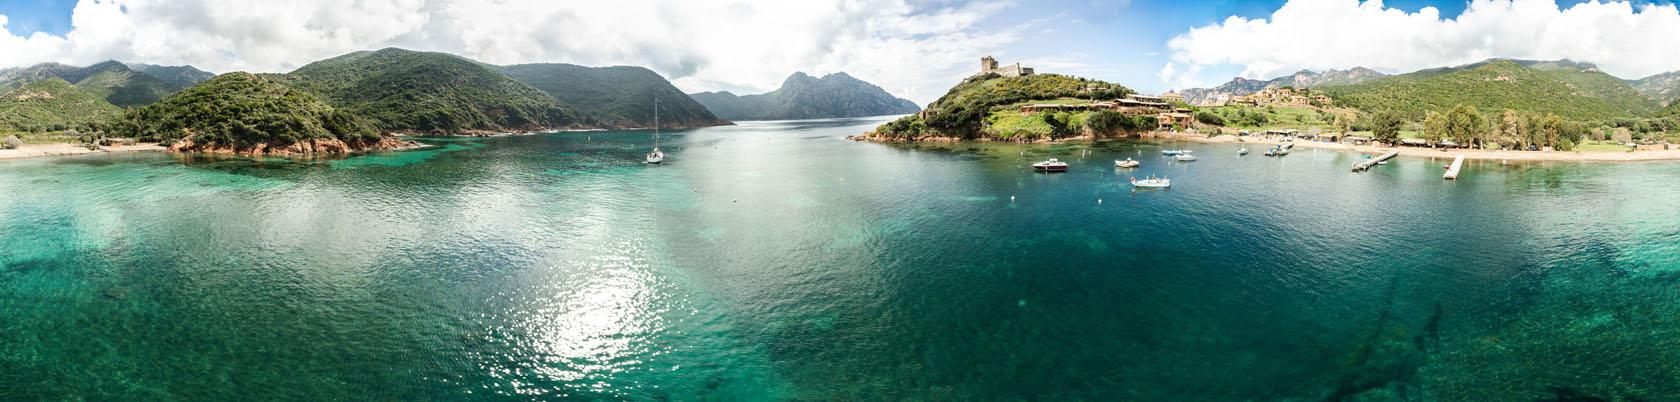 Girolata, Korsika